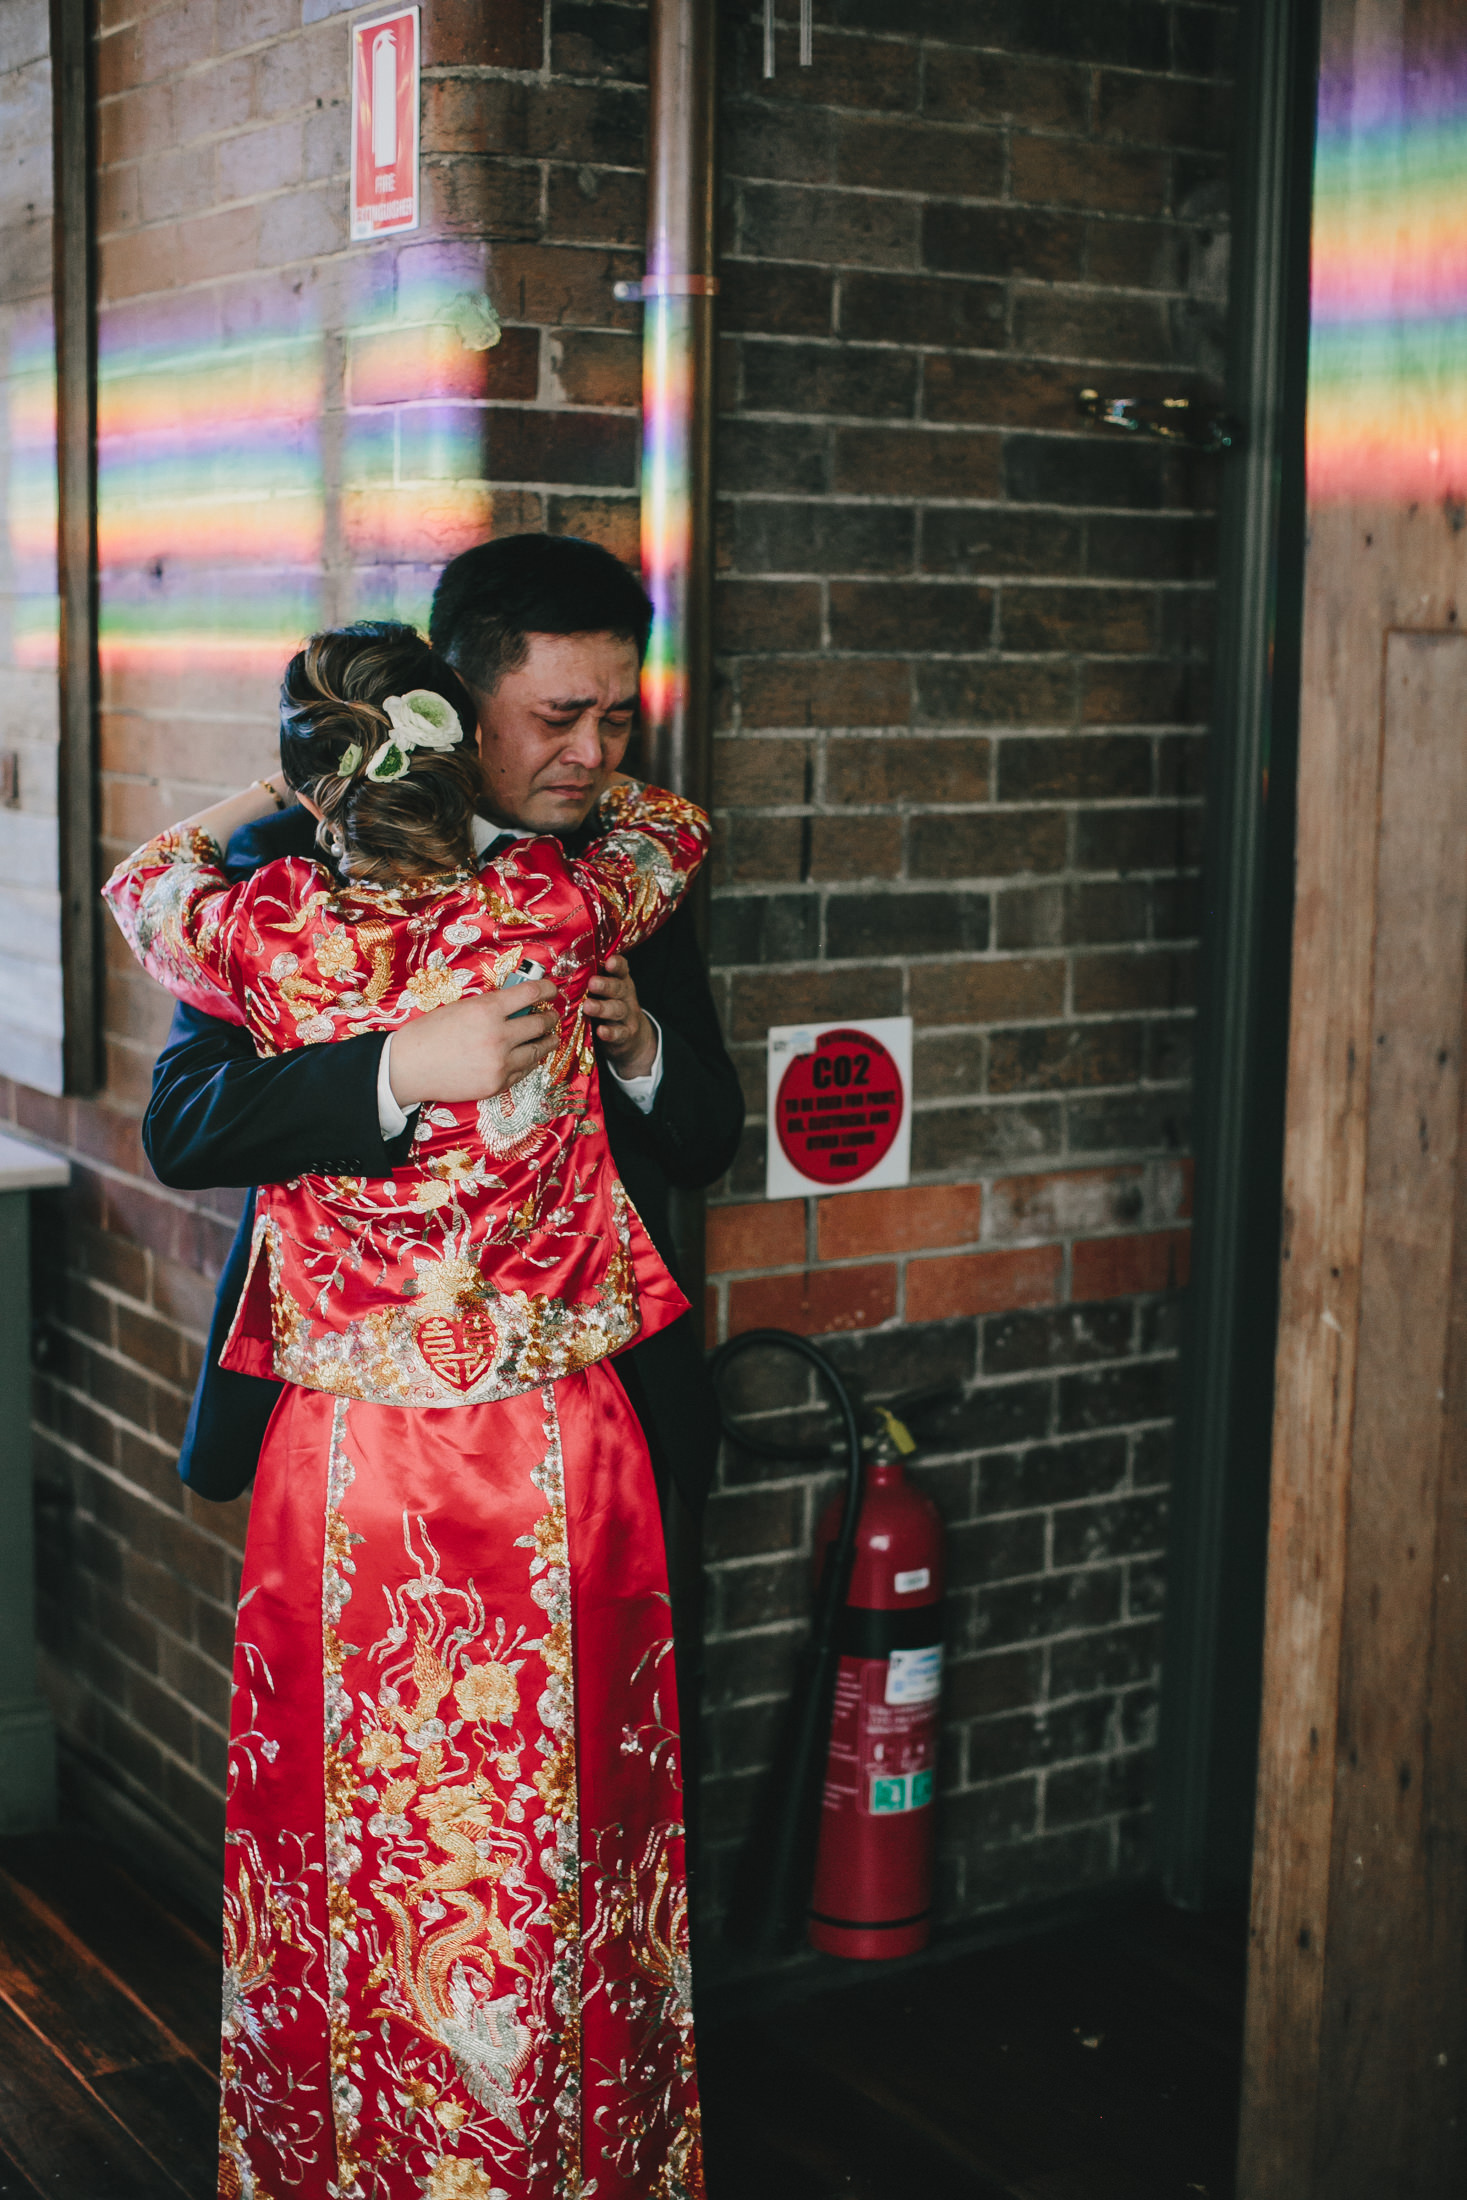 161_yusijensen_blog